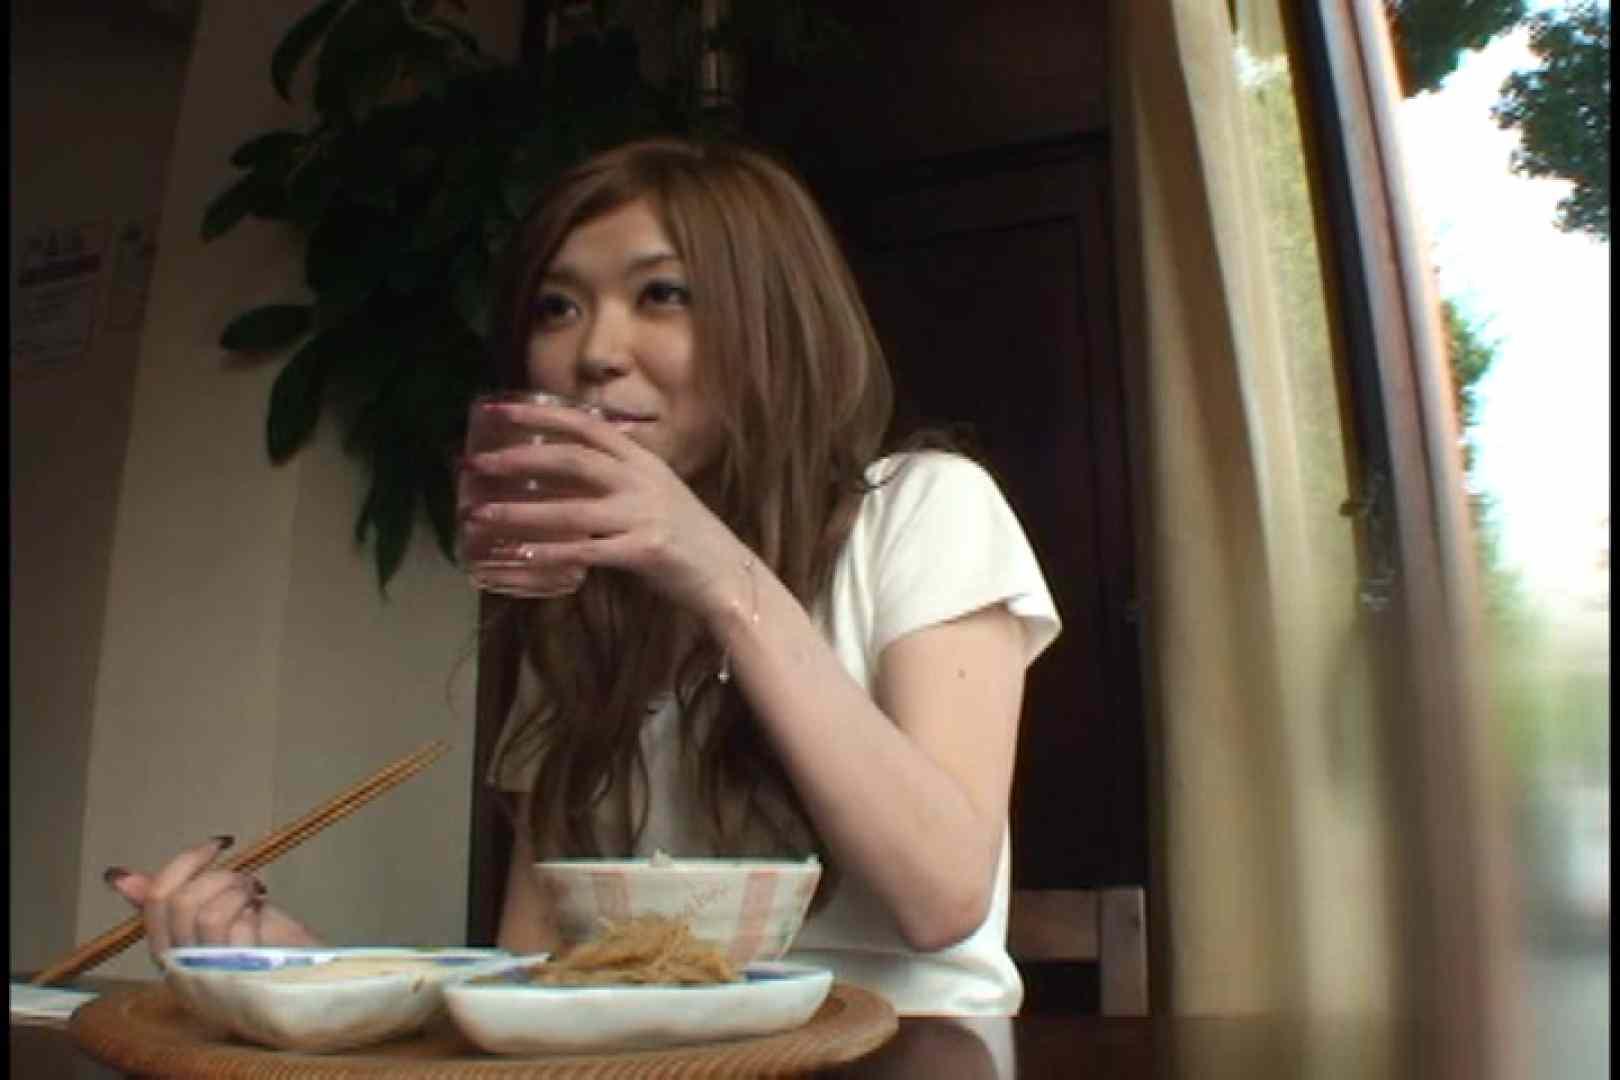 JDハンター全国ツアー vol.030 前編 女子大生のエロ動画 | 0  109PIX 47